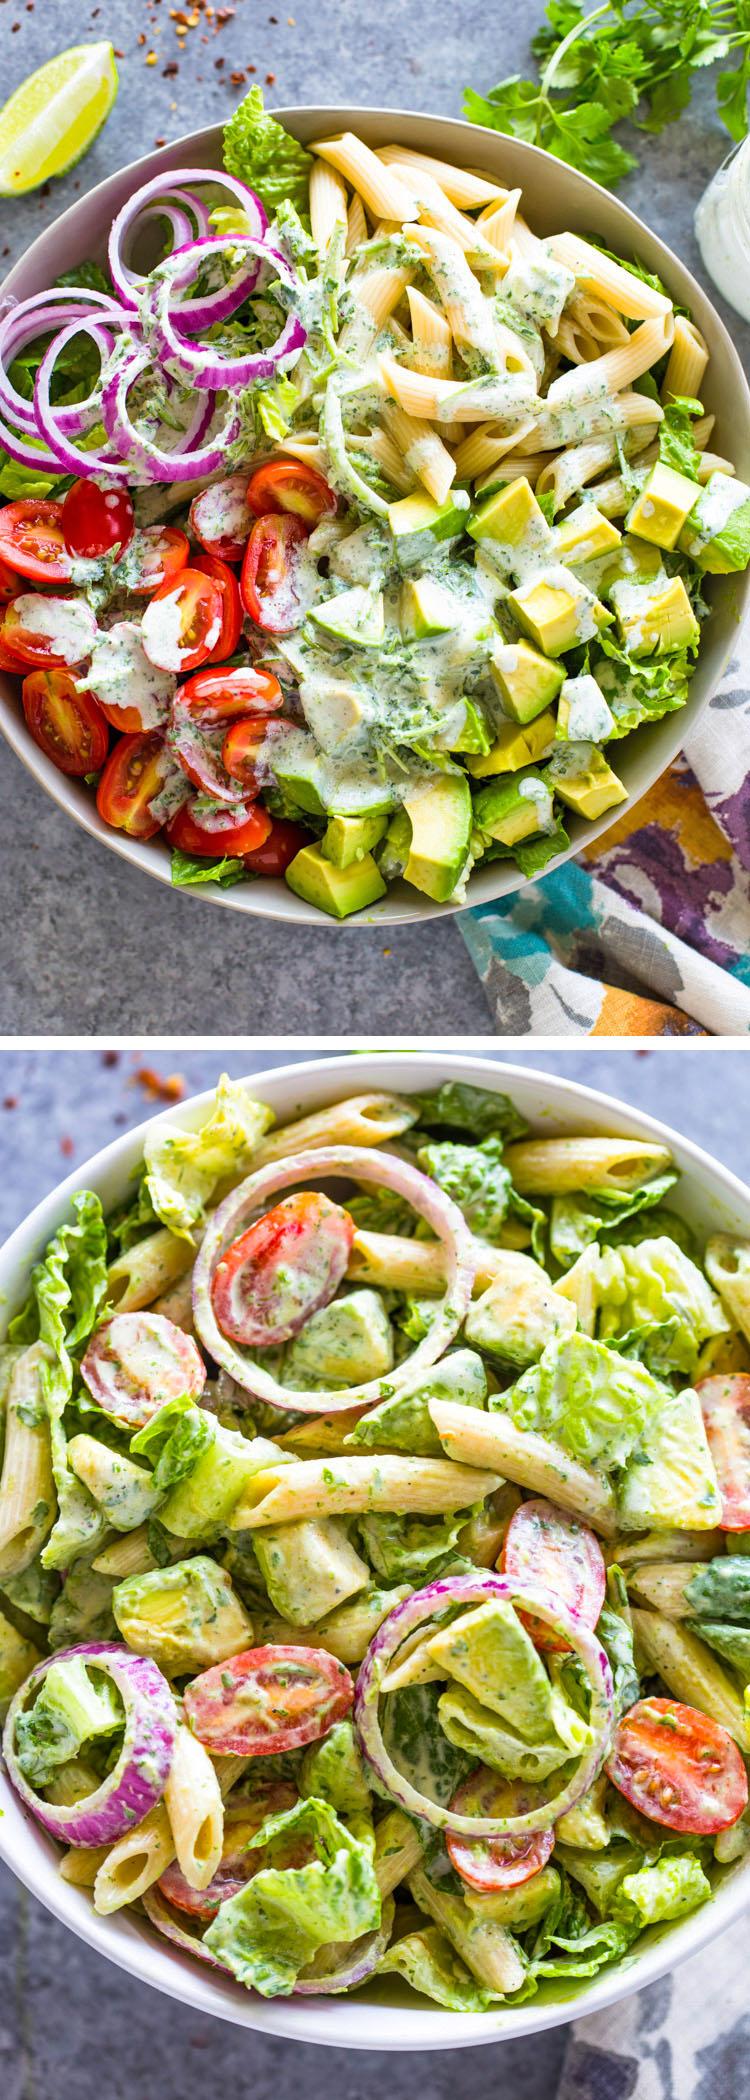 Creamy Avocado Tomato Pasta Salad